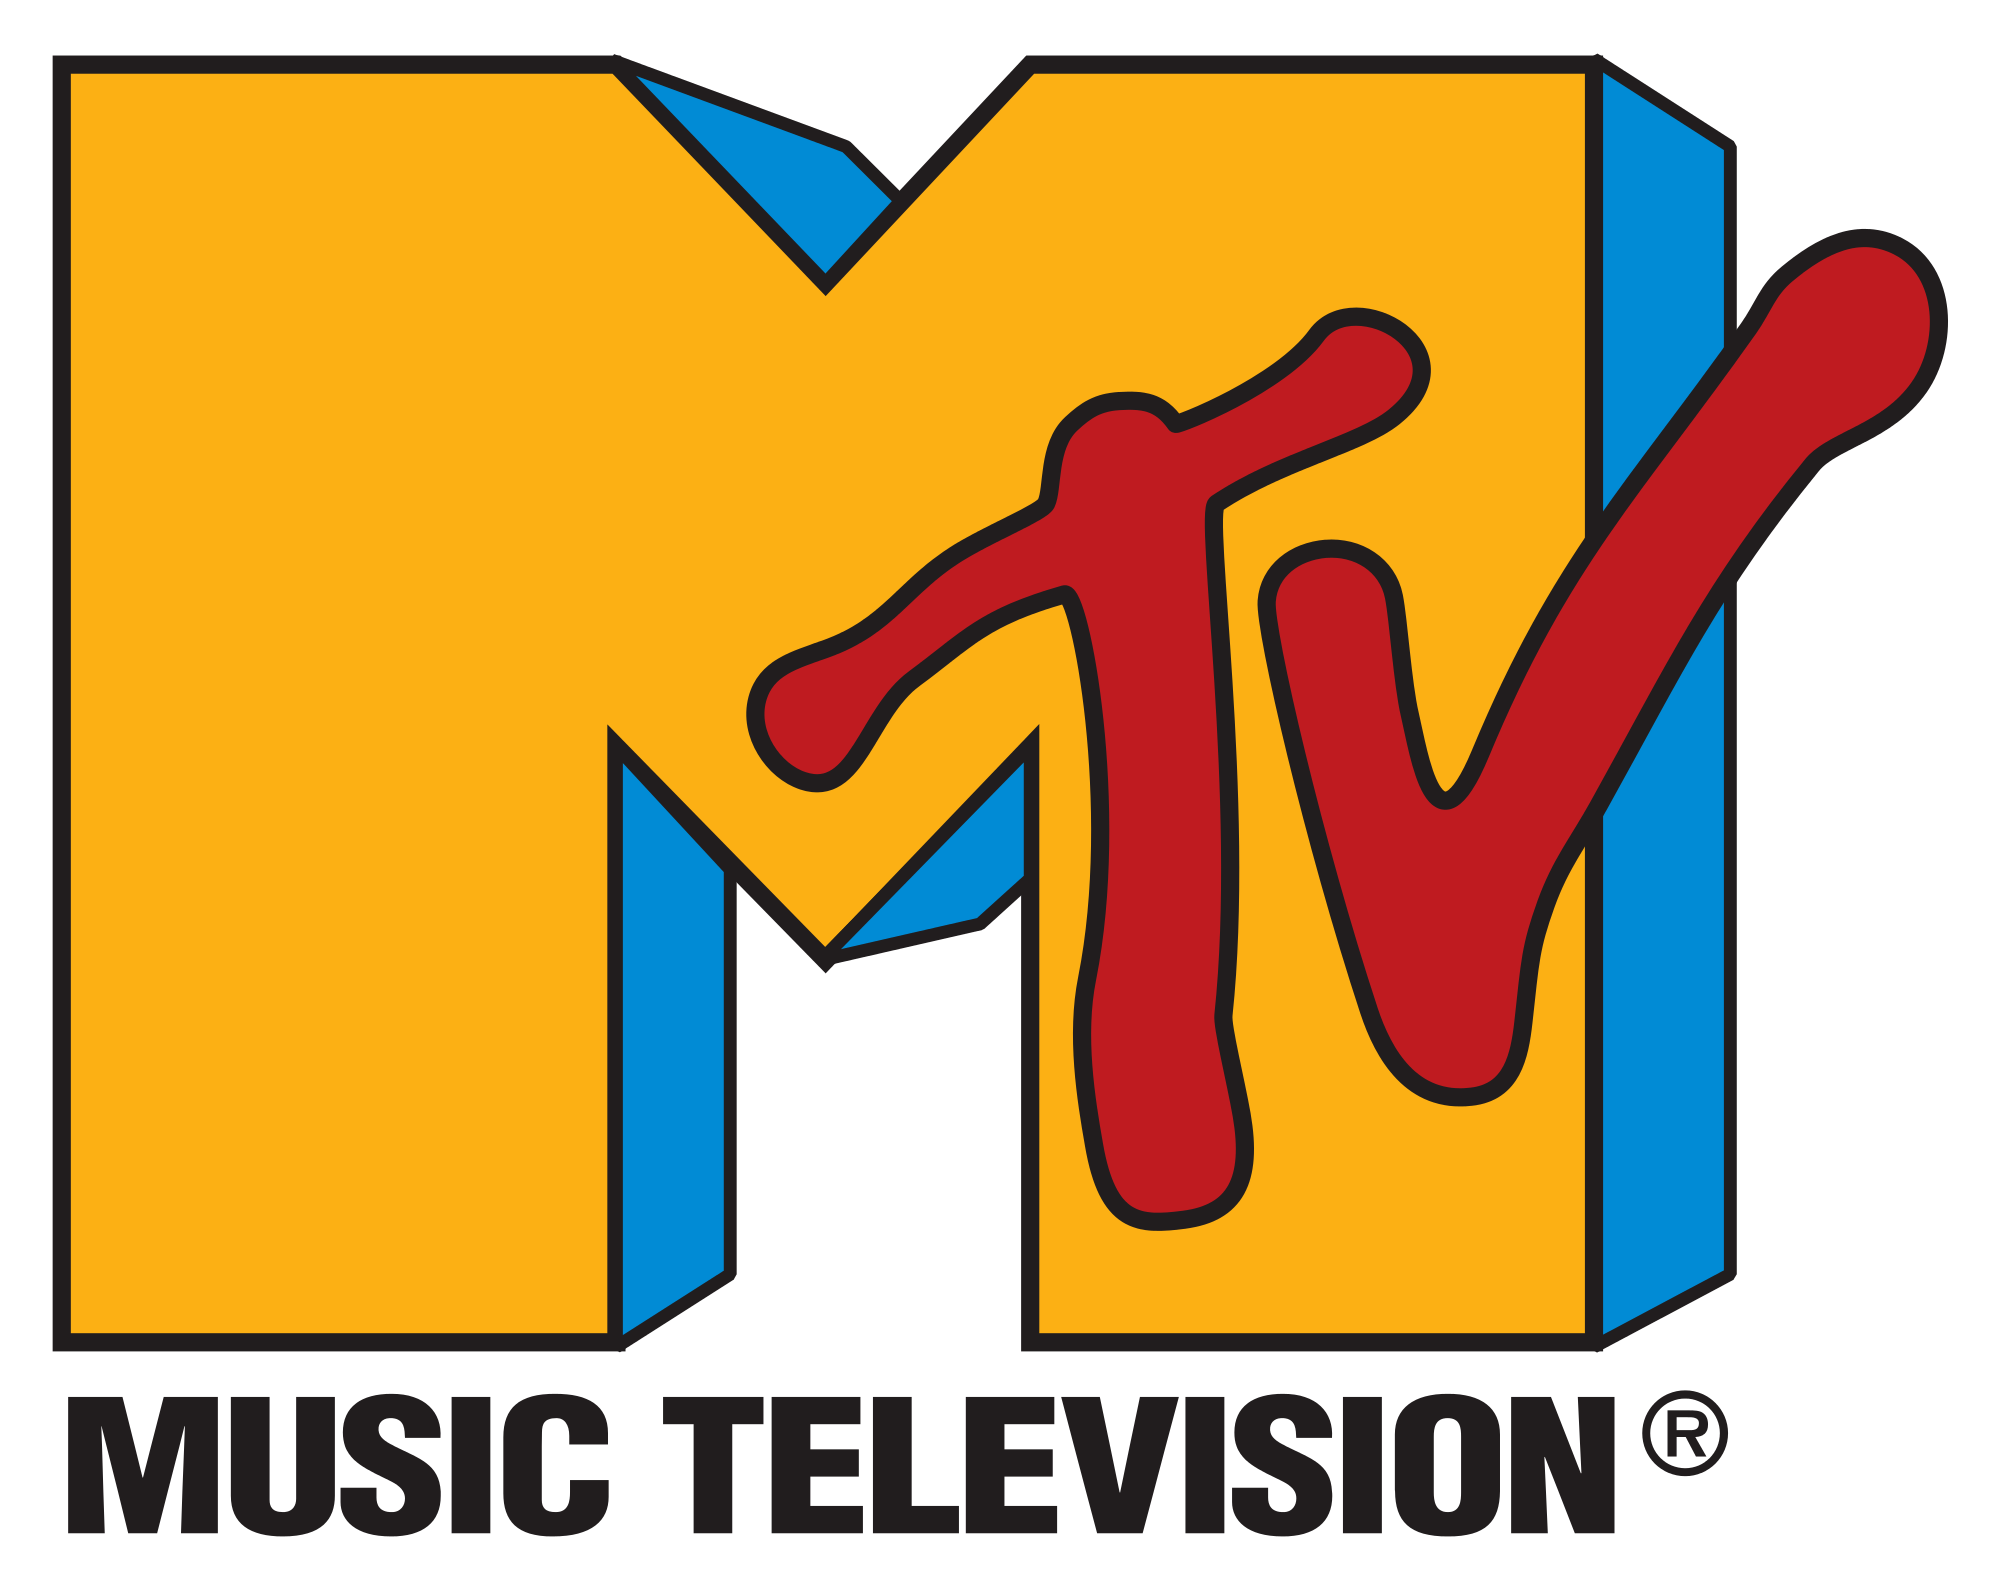 mtv music television png logo #3186